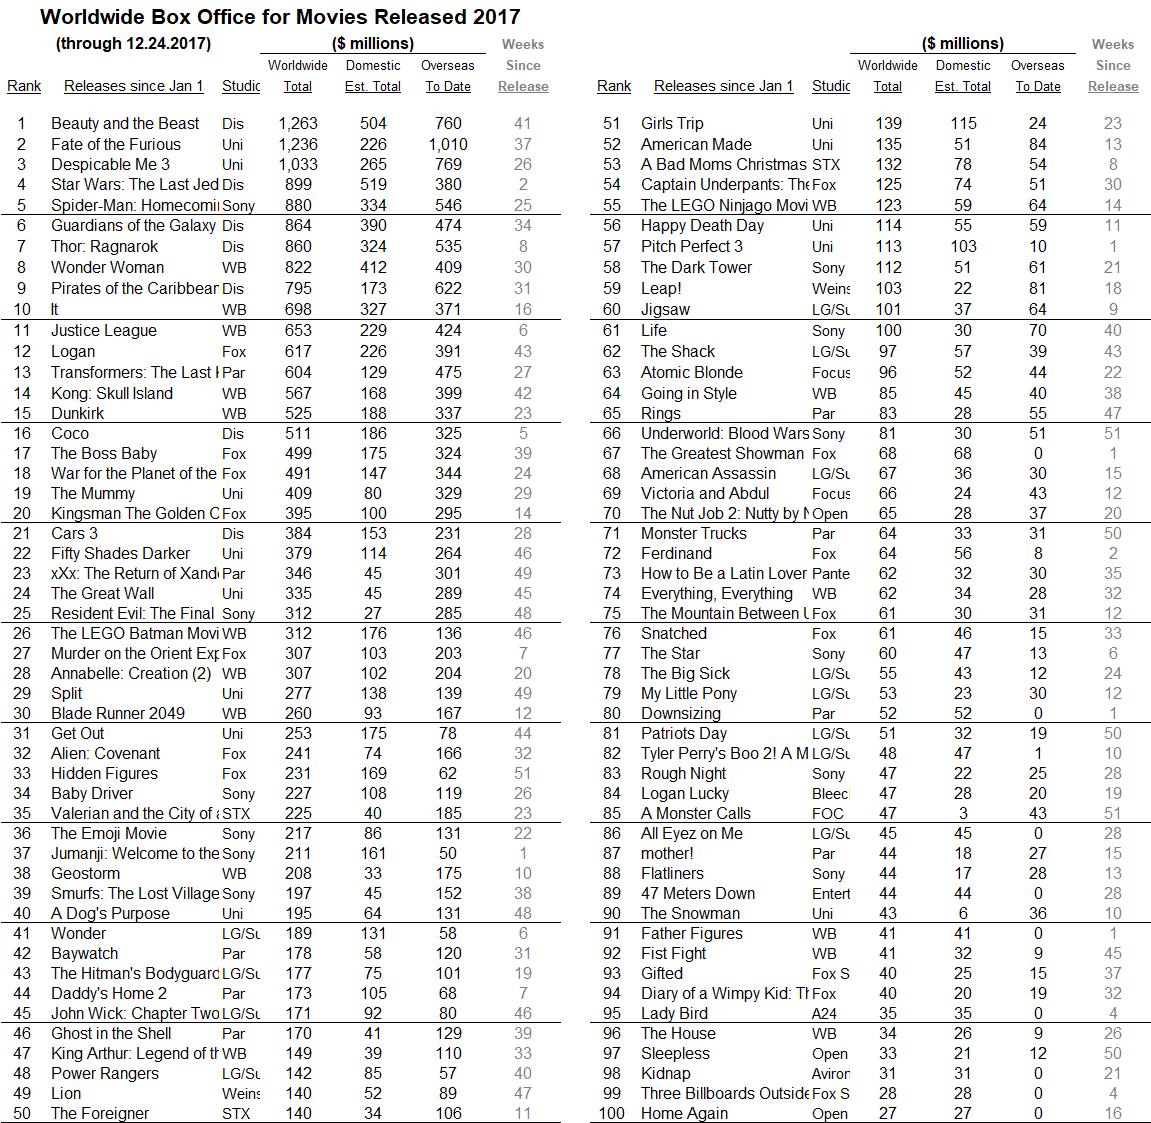 International 2017 through 2017 Dec 24